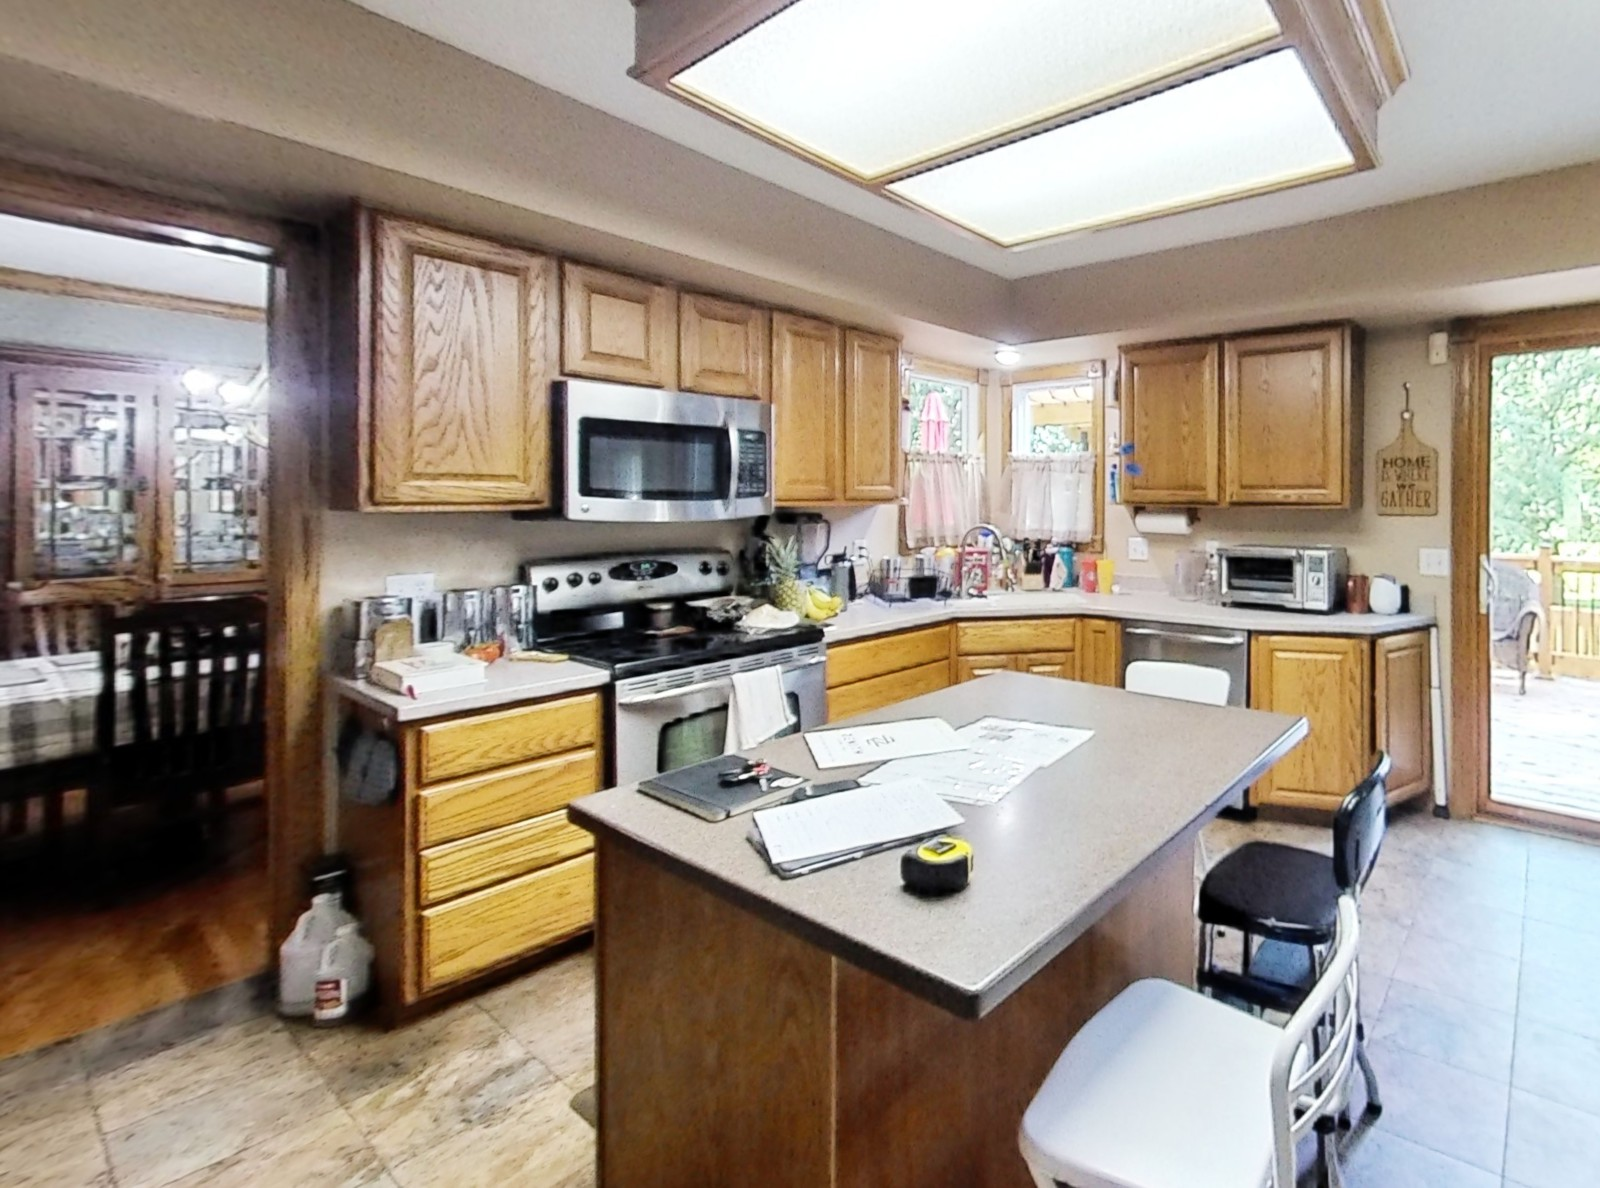 Johnston 90's Oak Overhaul Kitchen (before)